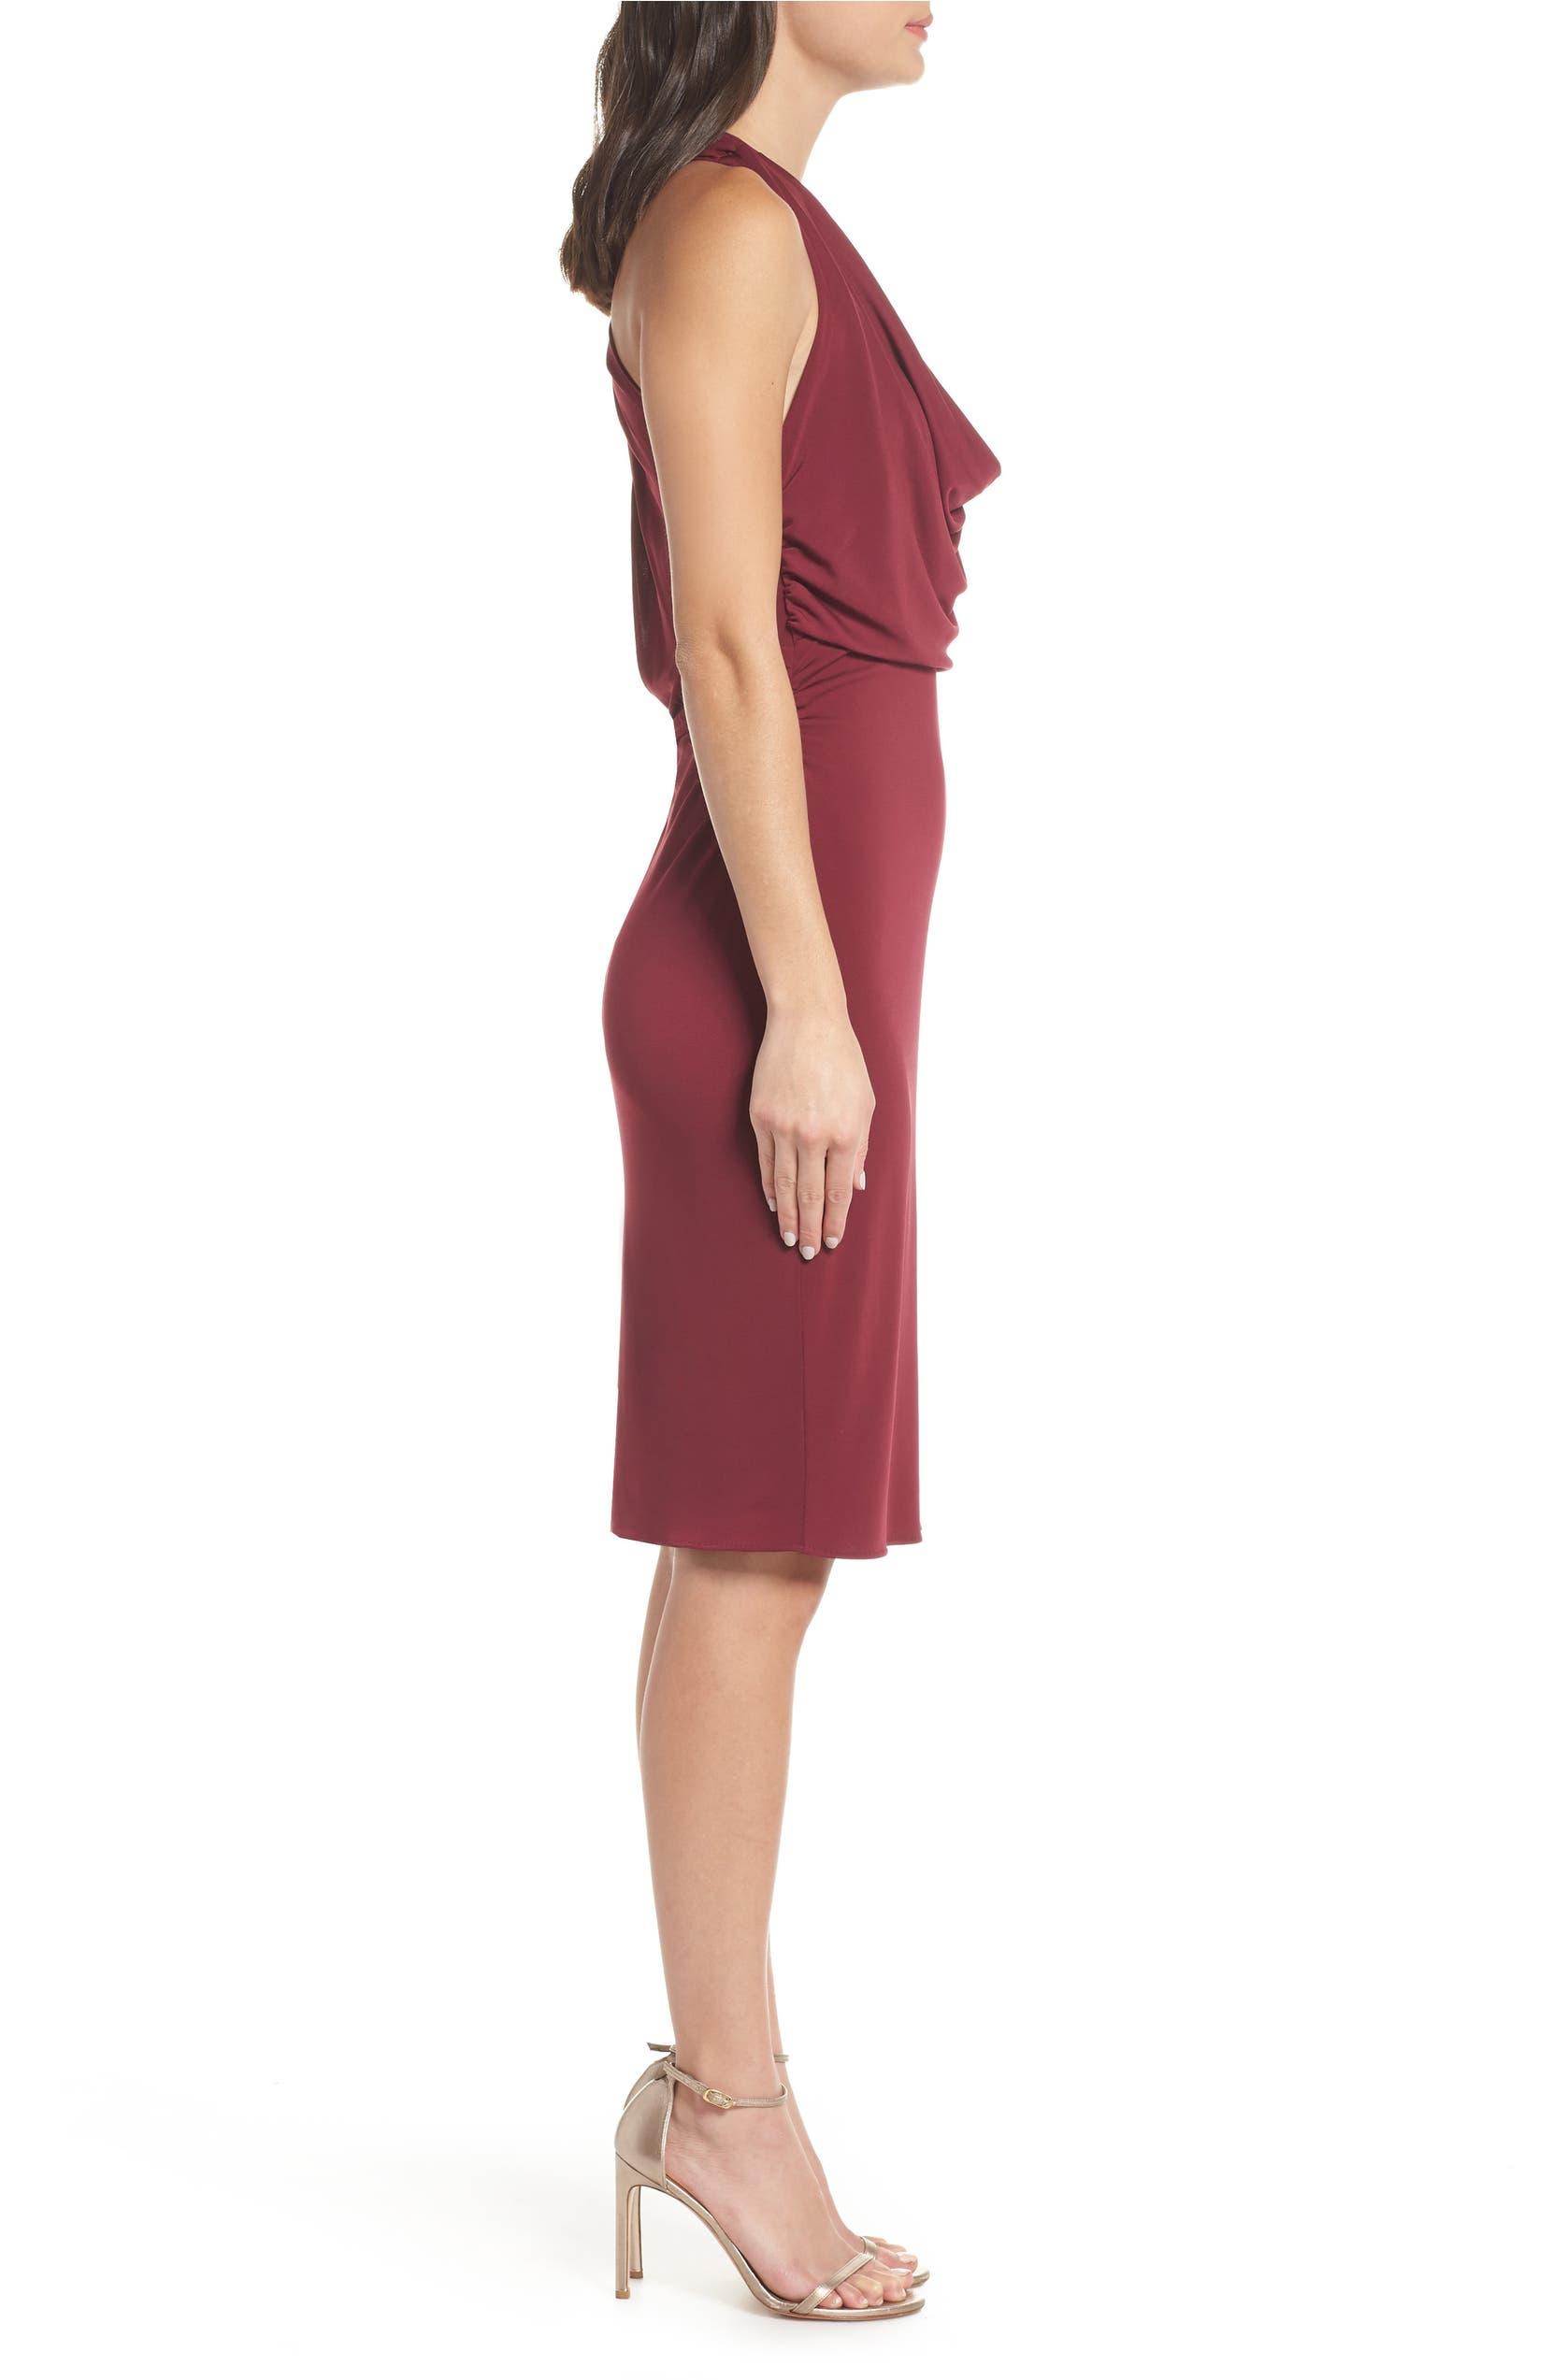 f8cc5d02c1085 Maria Bianca Nero Elise Cowl Neck Sleeveless Dress